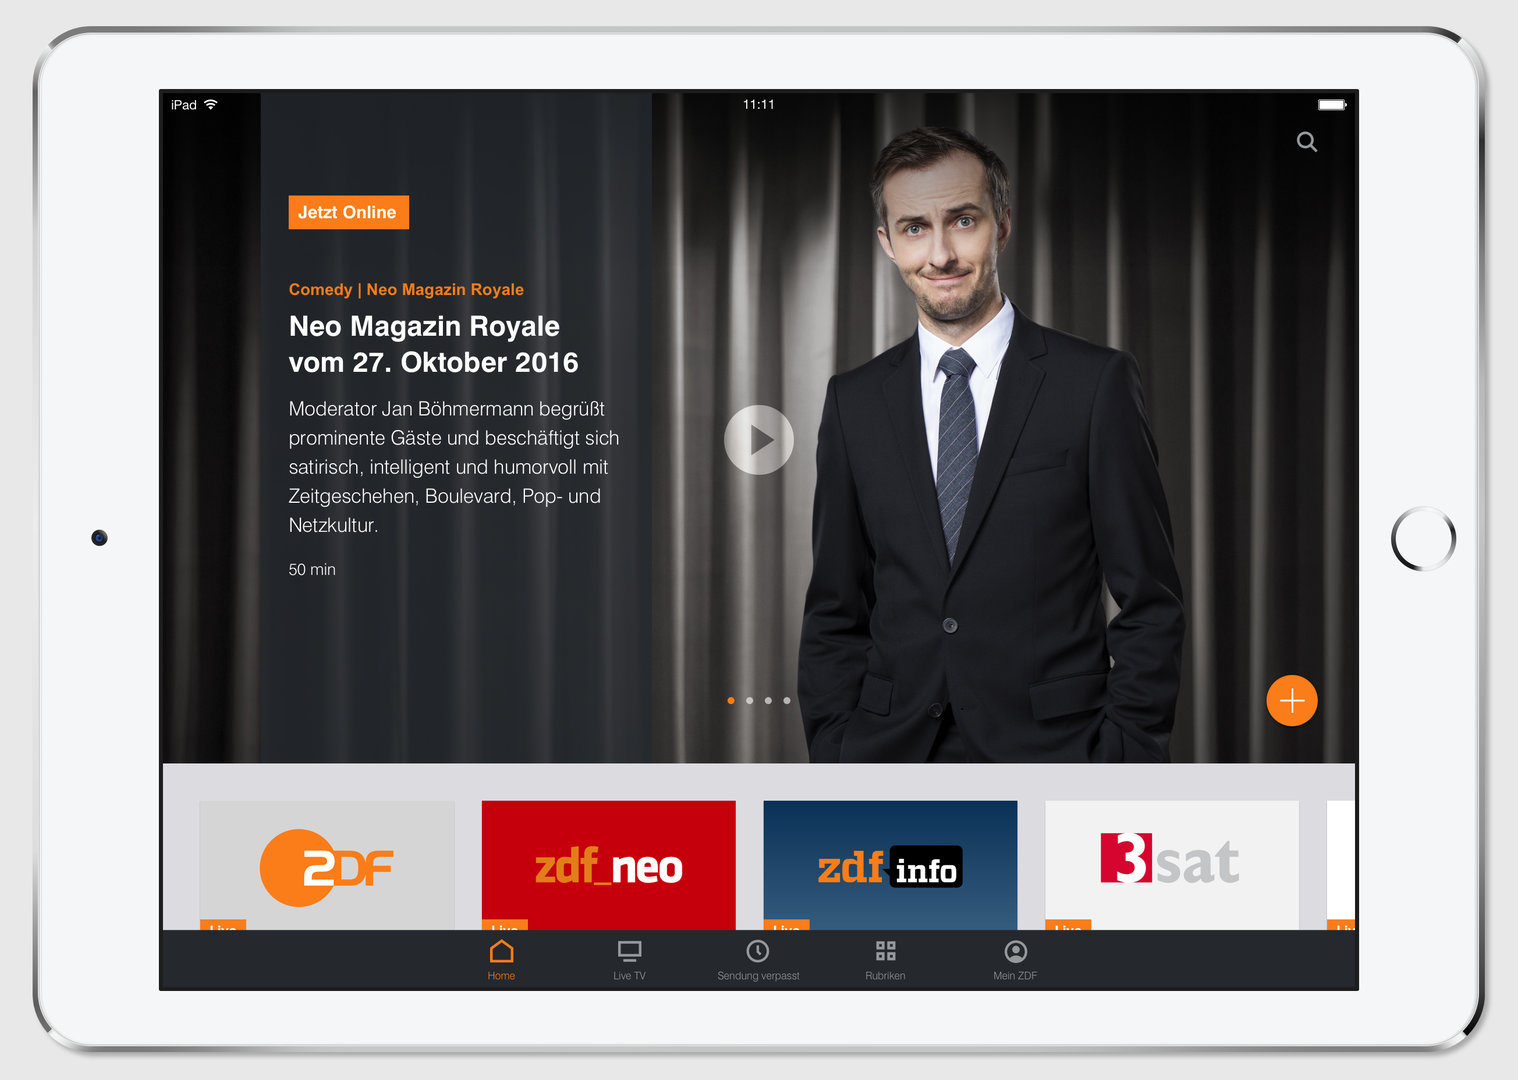 App der ZDFmediathek auf Tablet mit iOS-Betriebssystem